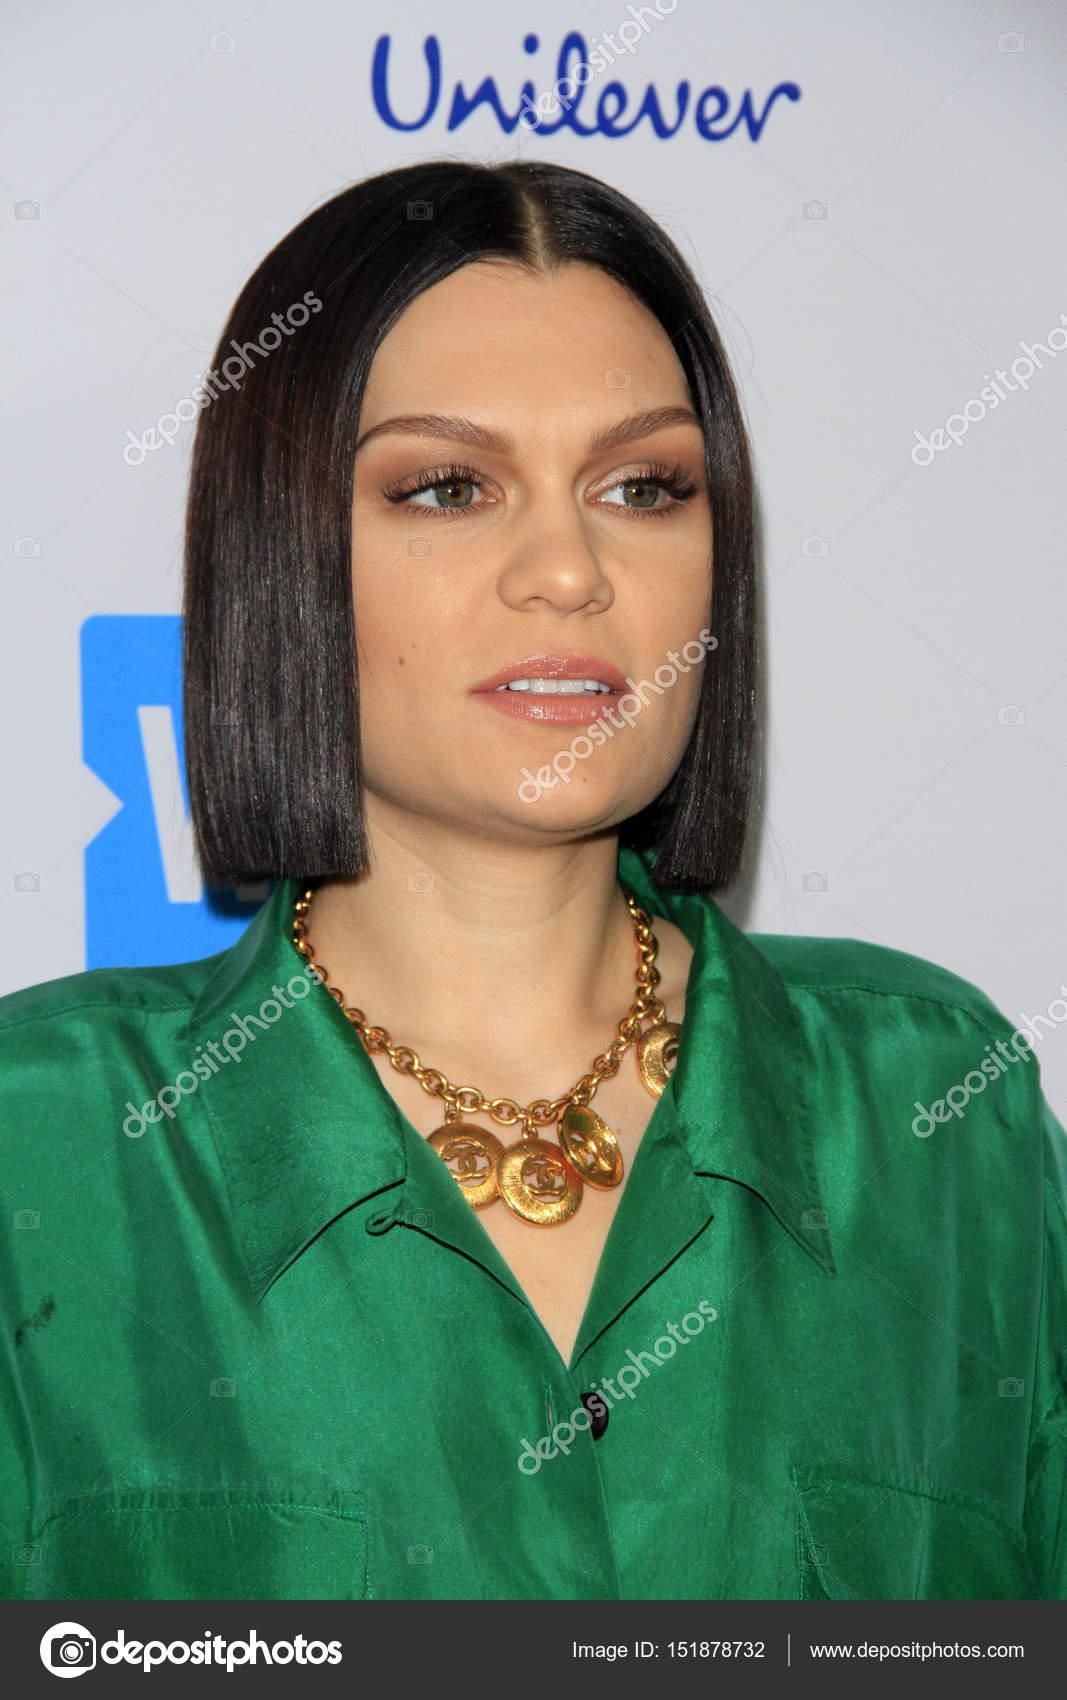 Jessie J Фото Джесси Джей, Джессика Эллен Корниш – Стоковое редакционное